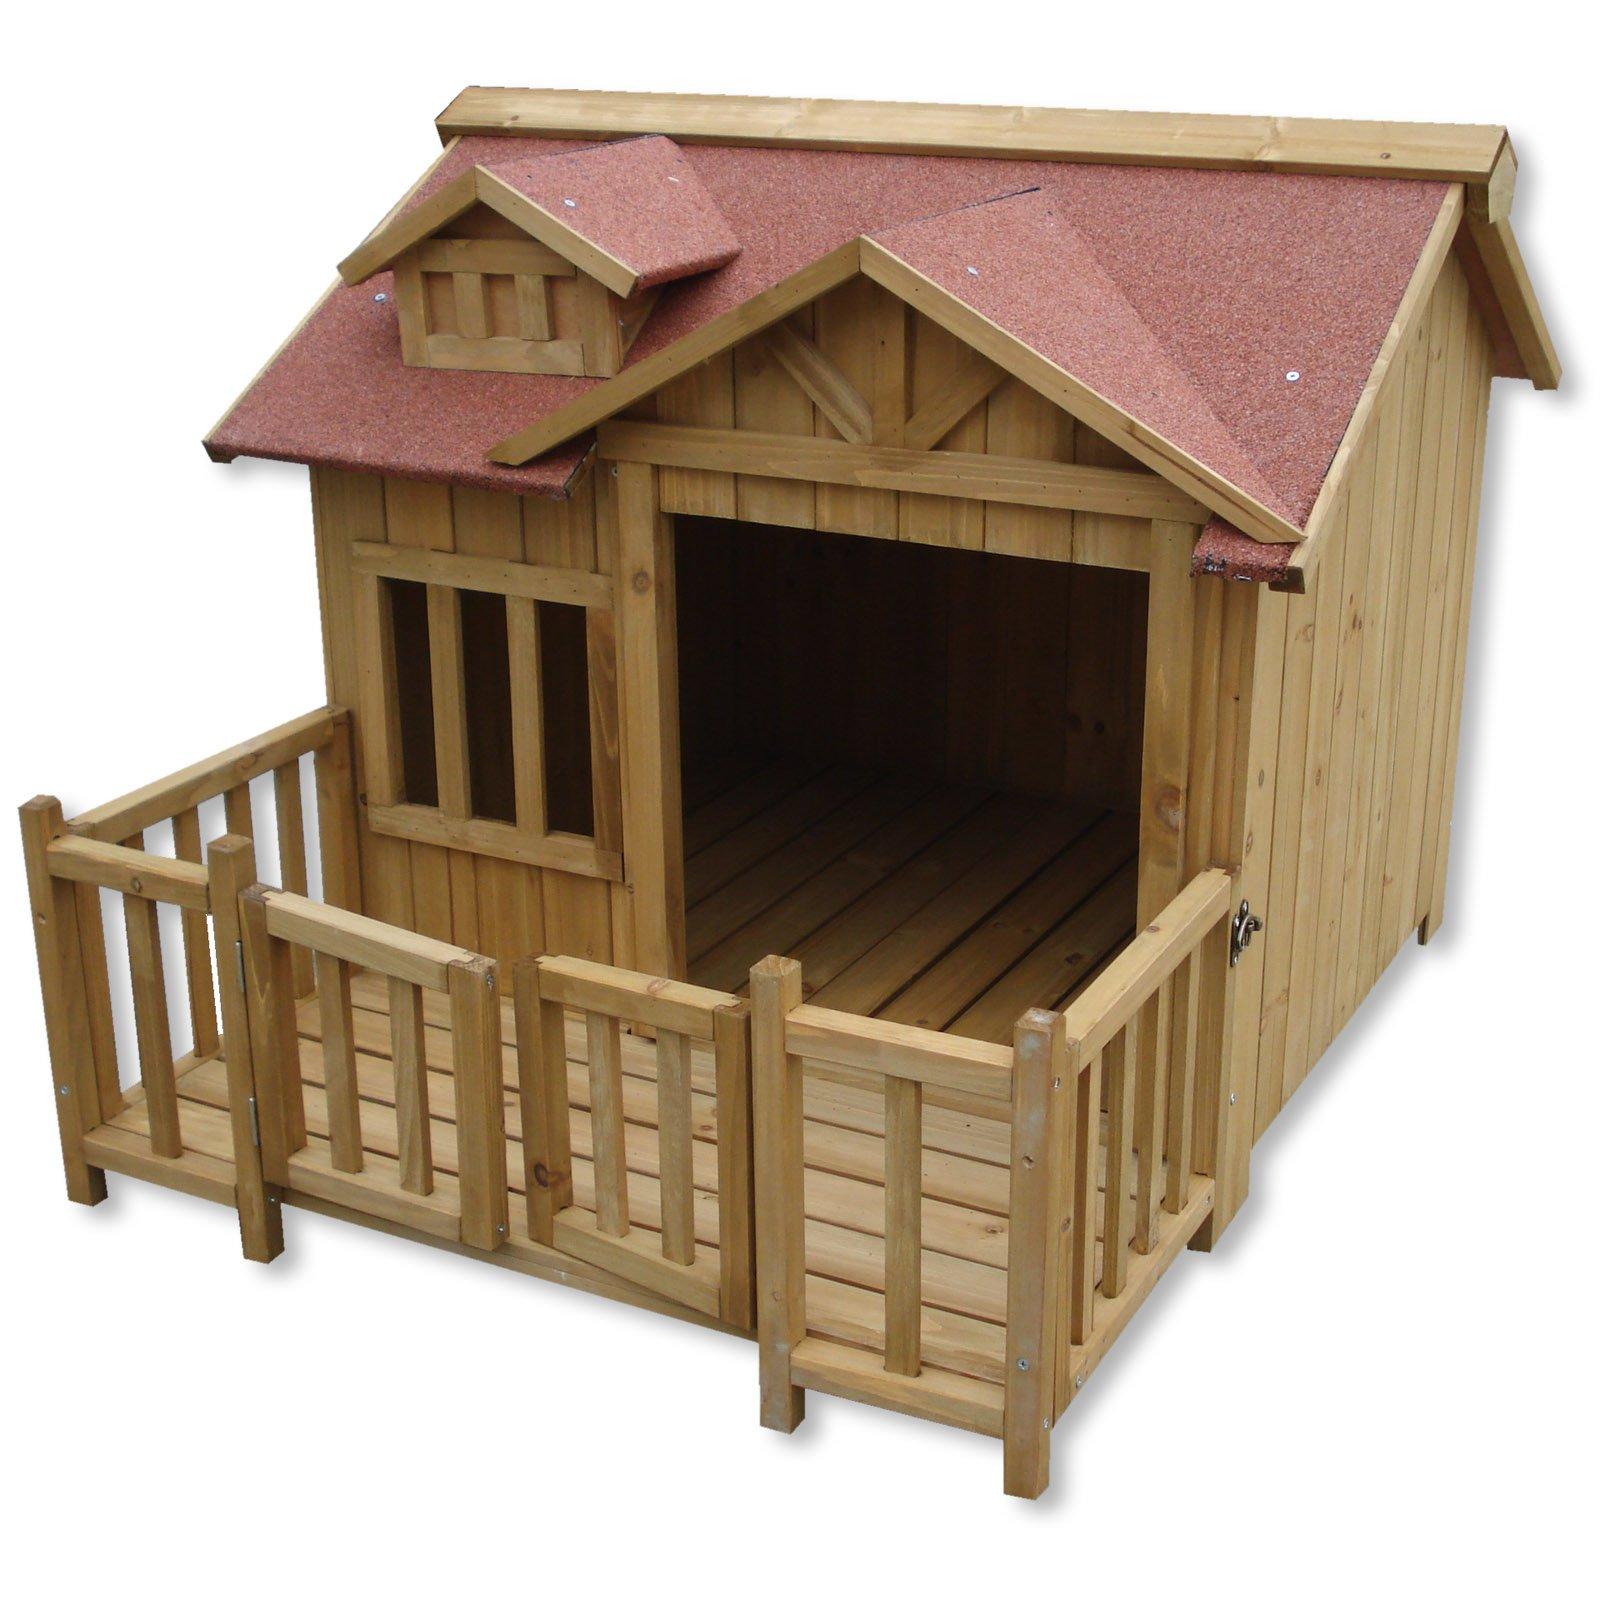 WilTec Caseta Perros XL Luxus Perrera Madera balcón terraza jardín Exterior Mascotas Extra Grande: Amazon.es: Productos para mascotas